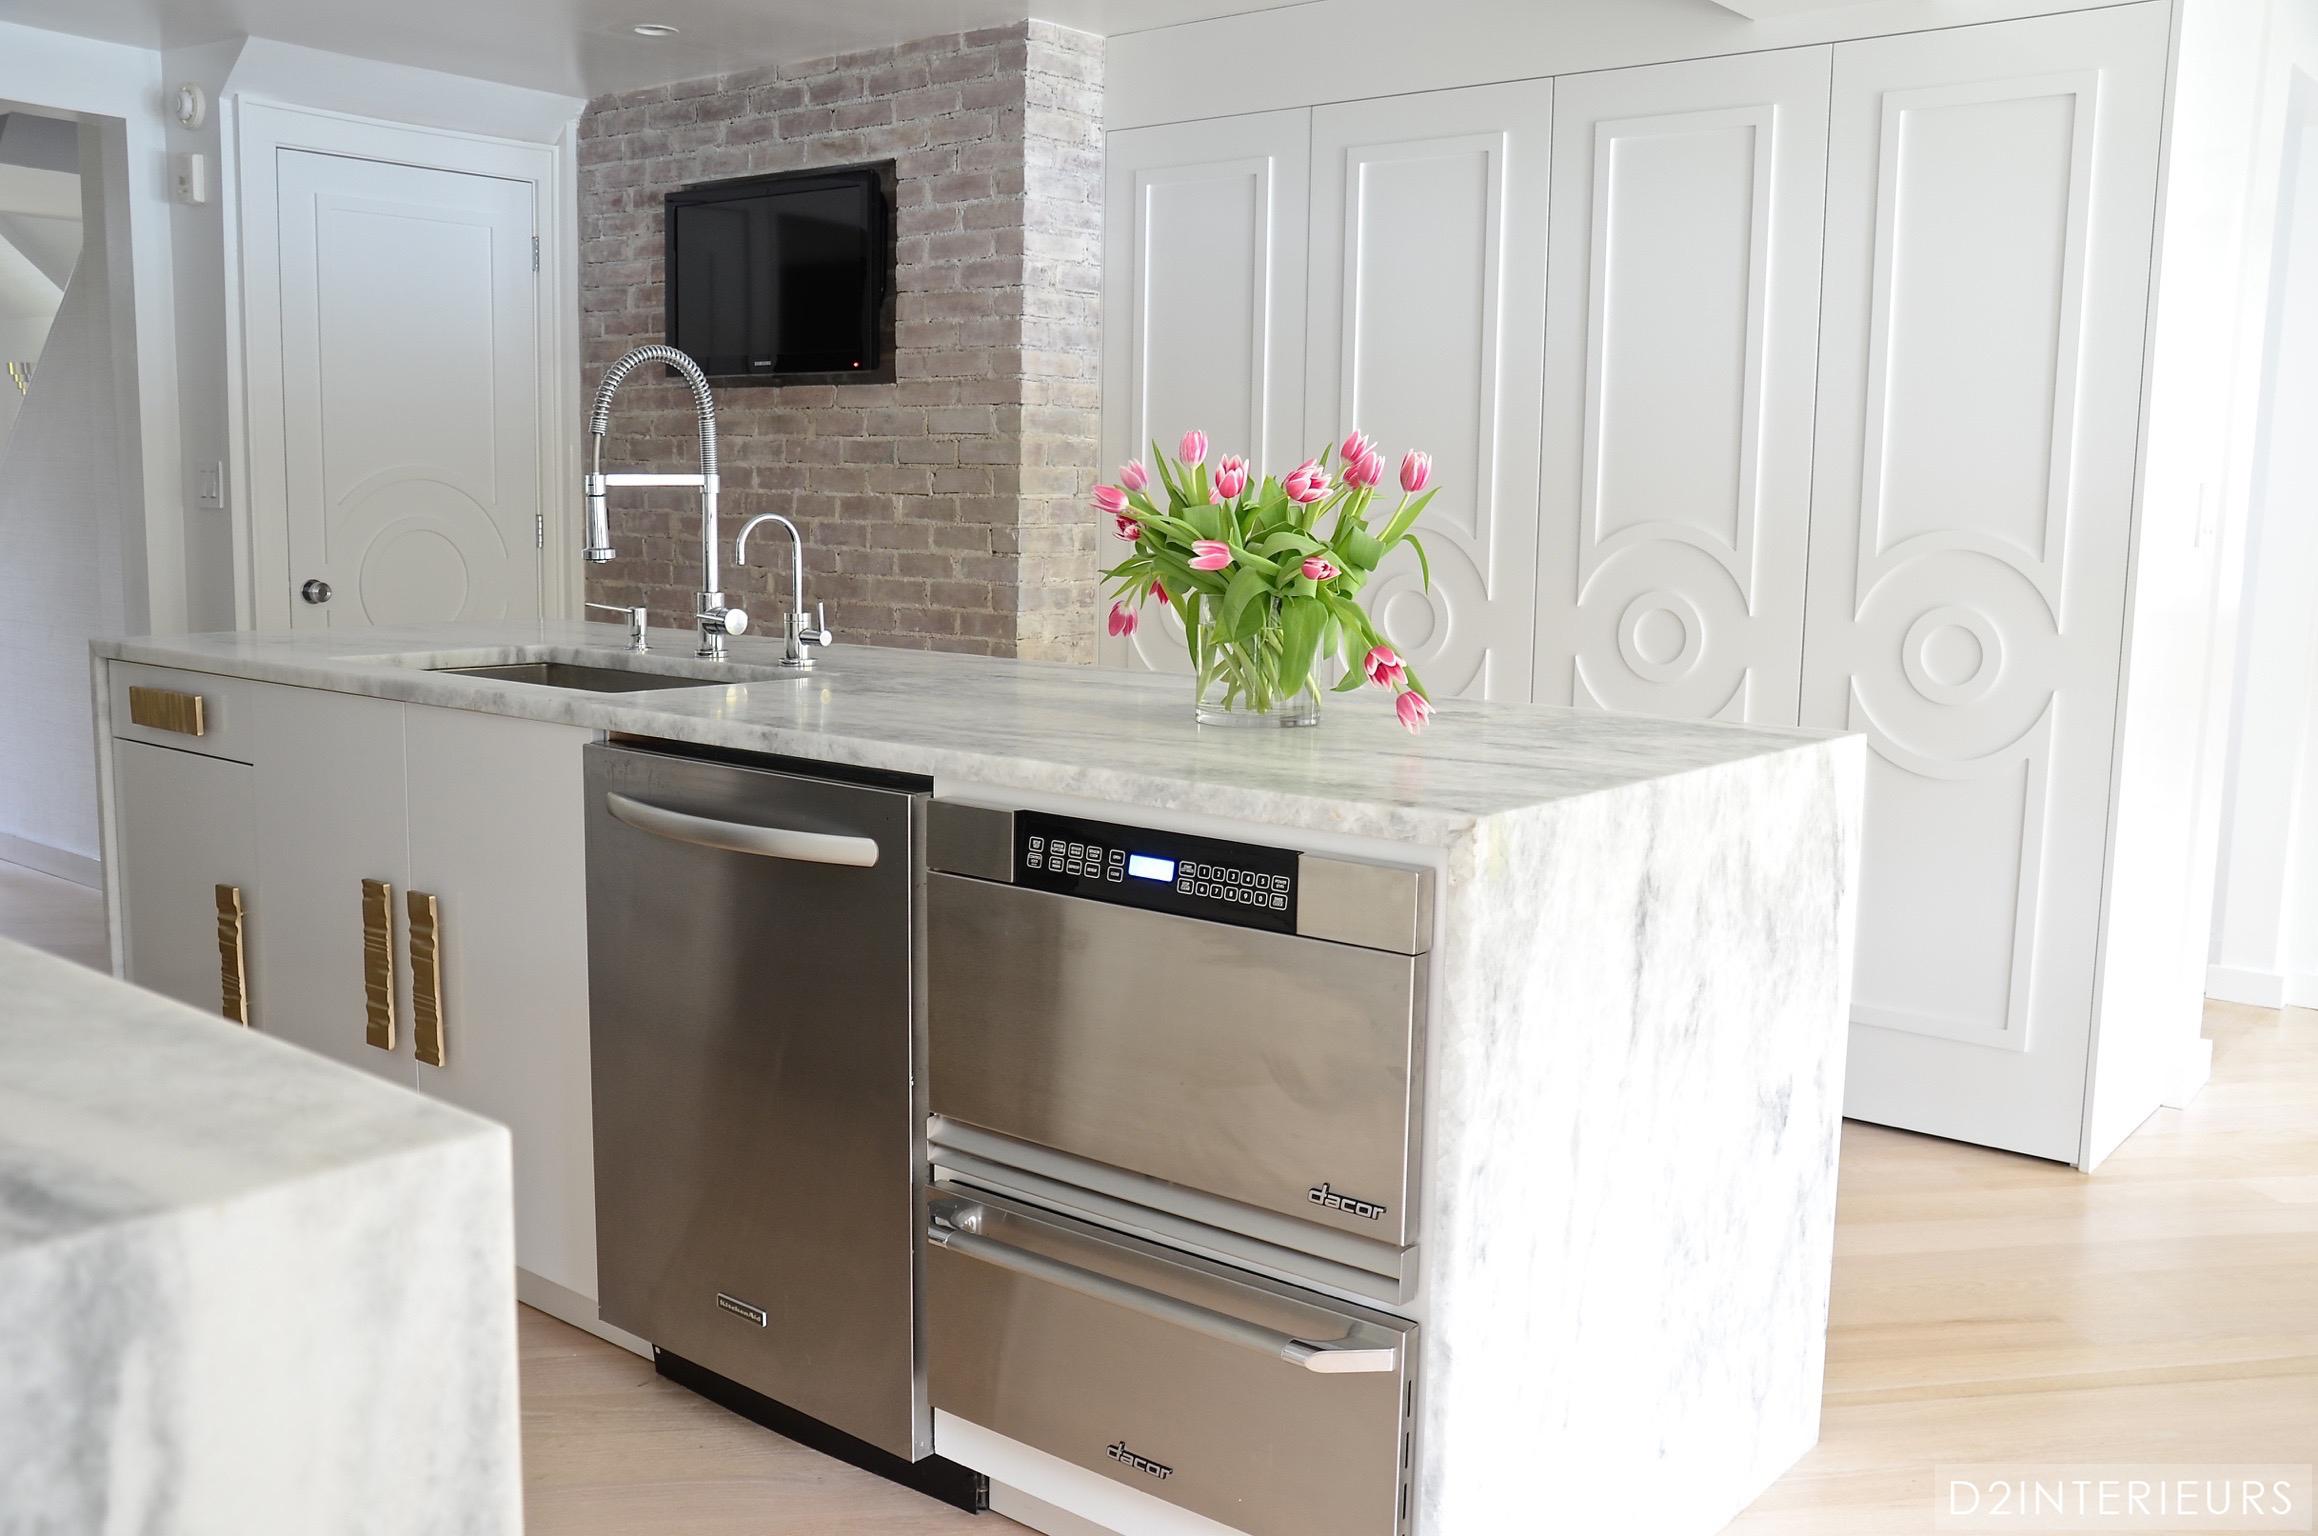 kitchen-botox-6b.jpg